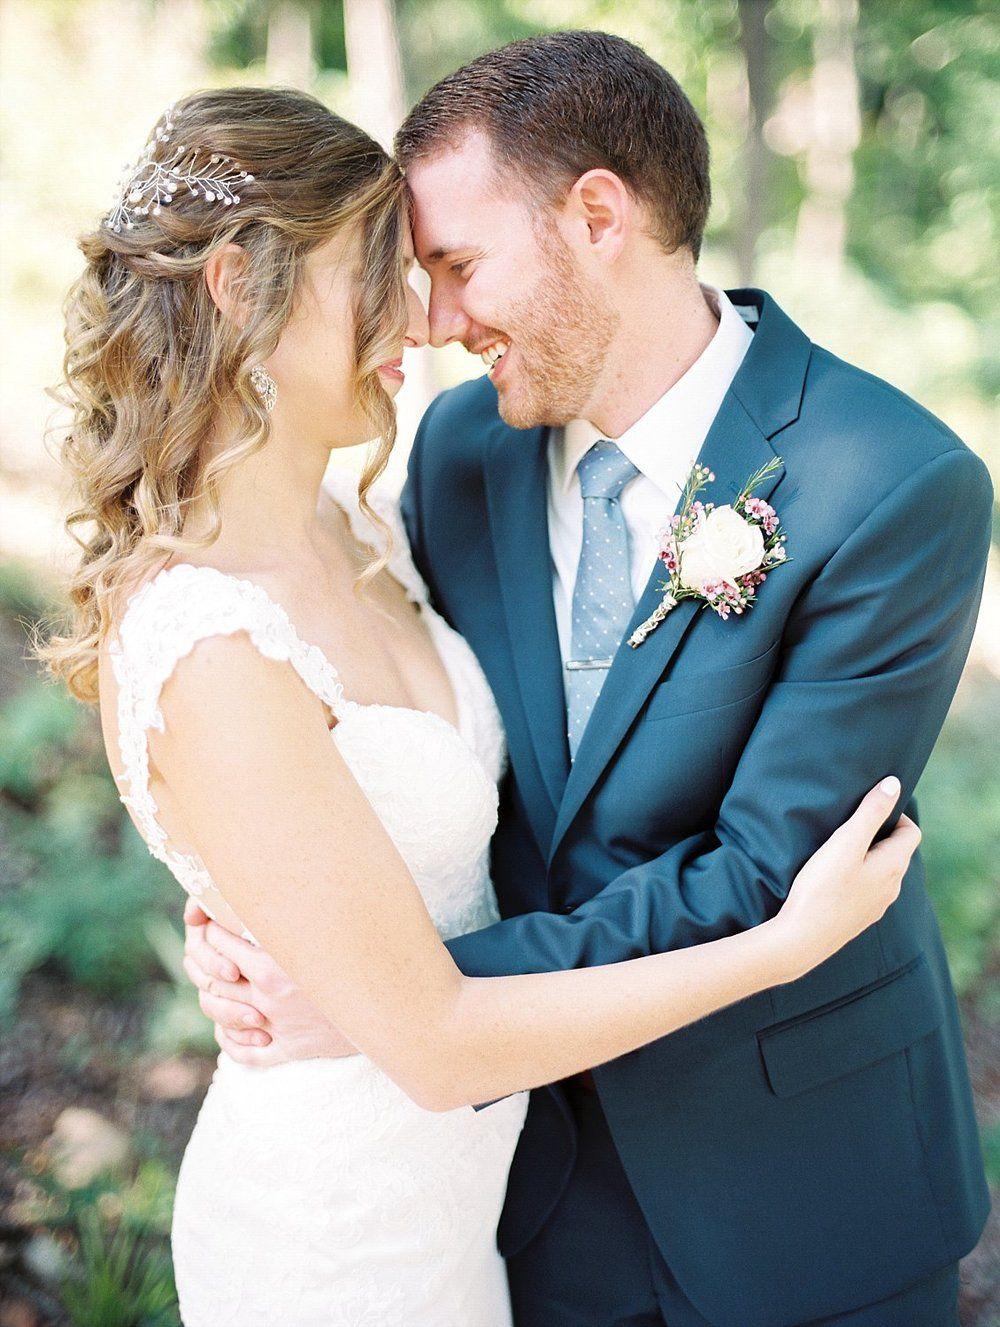 Norris Lake Wedding - Amber + Nathan   Pinterest   Amber, Lakes and ...